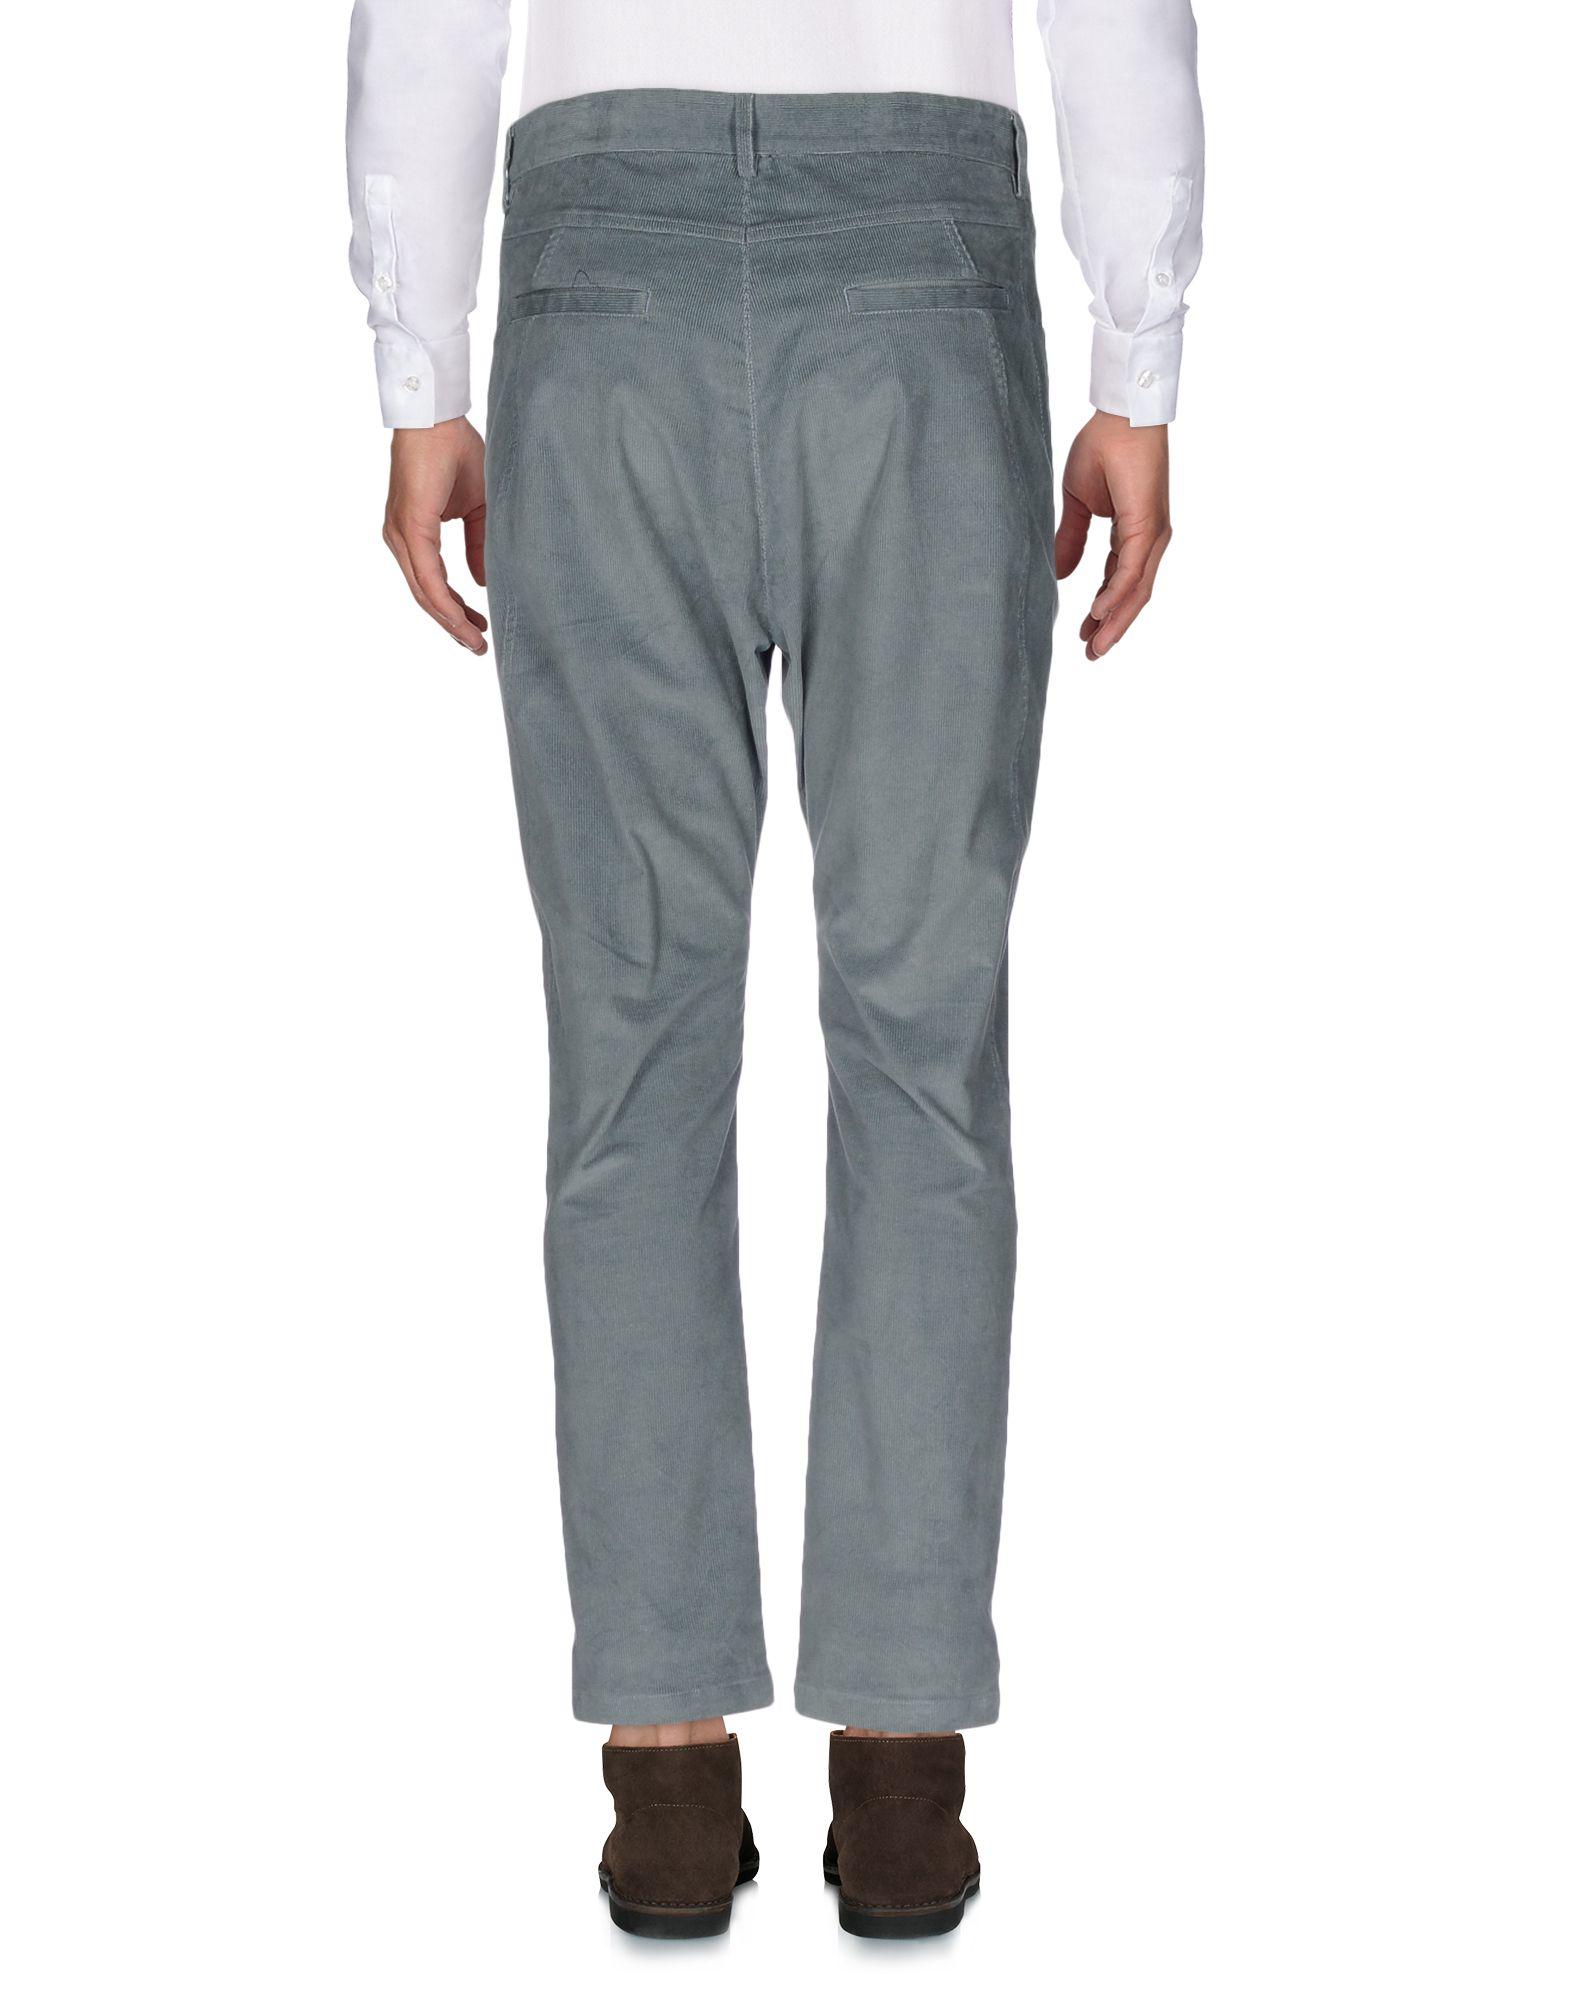 Antonio marras Casual Trouser in Gray for Men